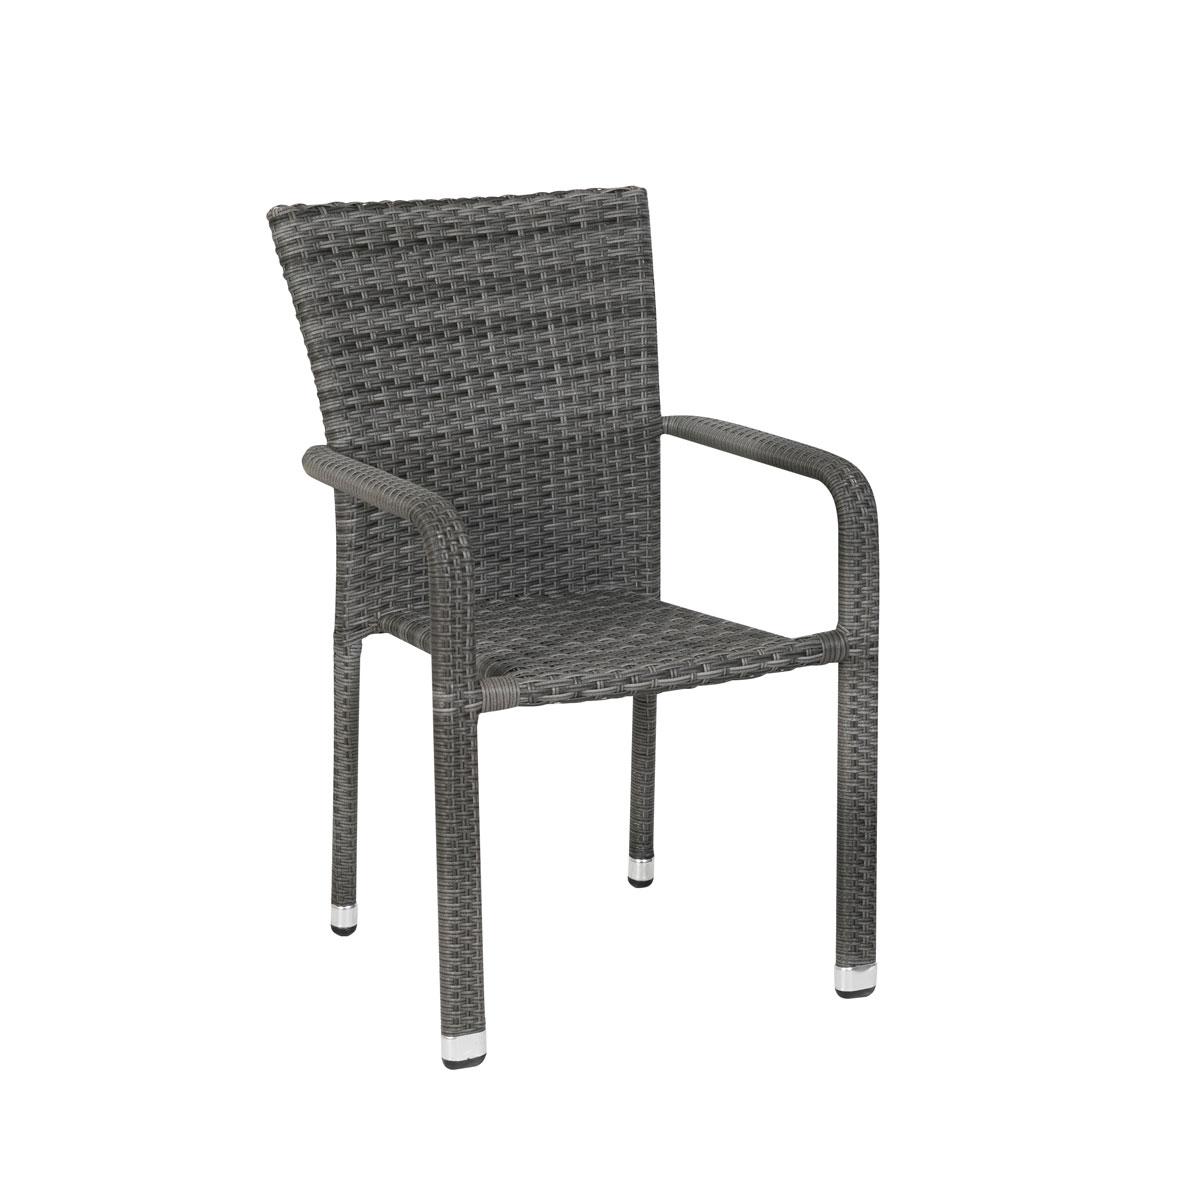 "Gartenstühle - Stuhlset ""Manila"", 4 Stück  - Onlineshop Hellweg"